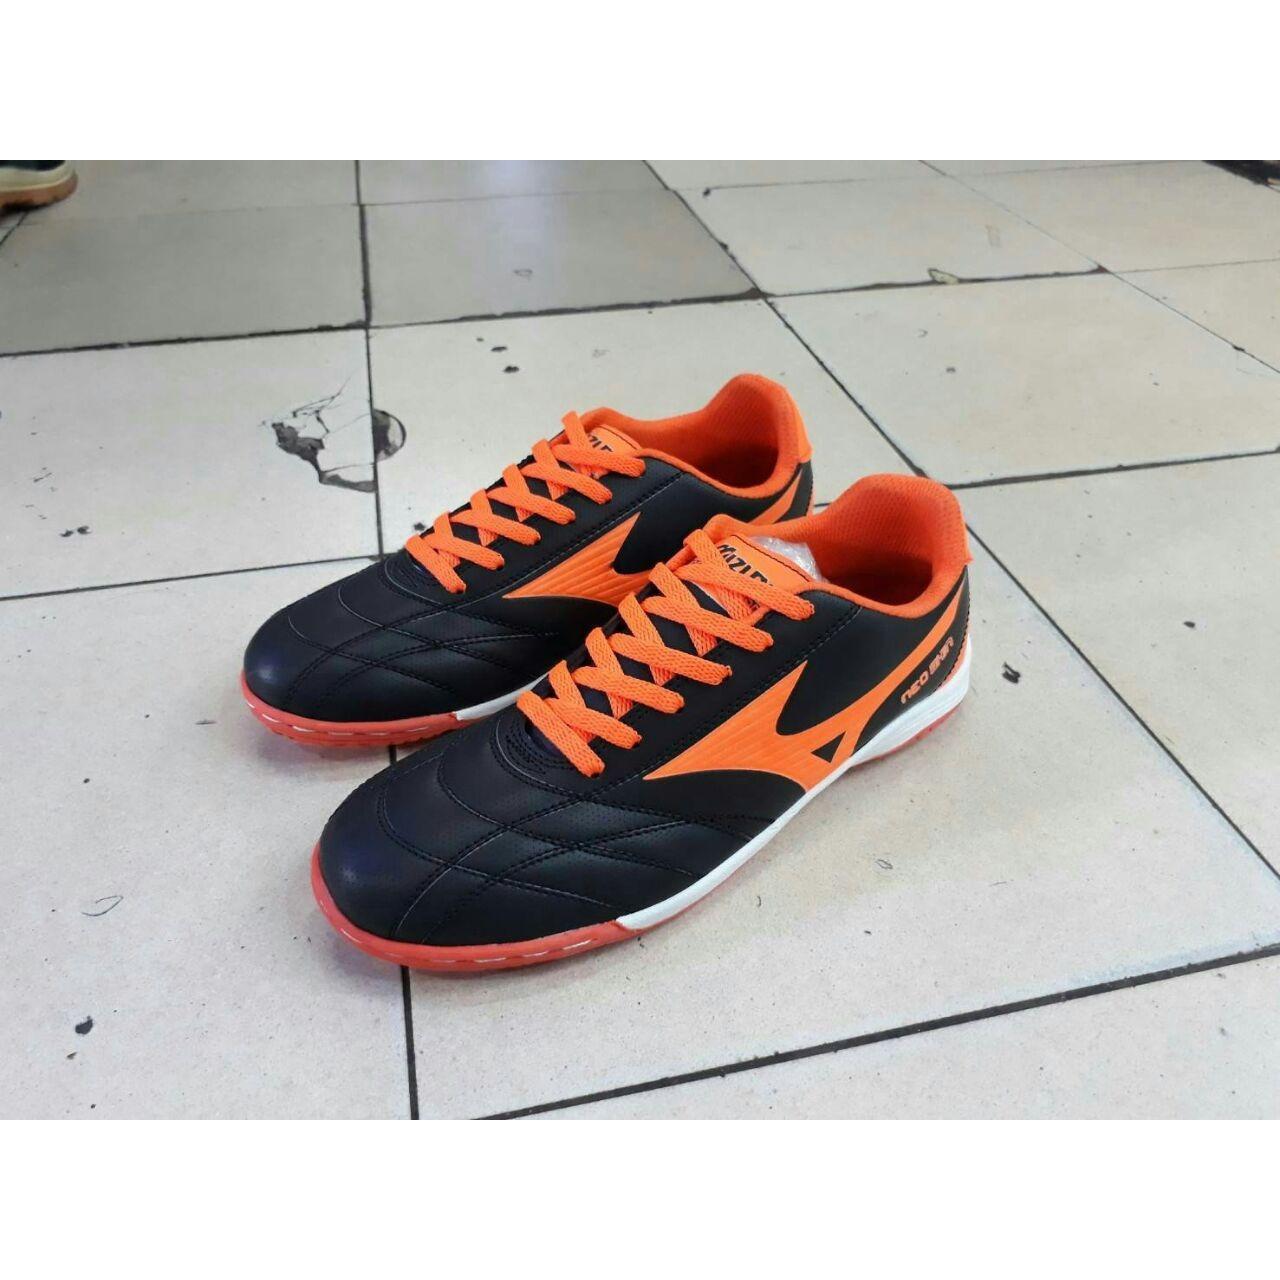 Garsel Sepatu Olahraga Futsal Shoes Pria Gun 7510 Bahan Leather ... c95c0b5835